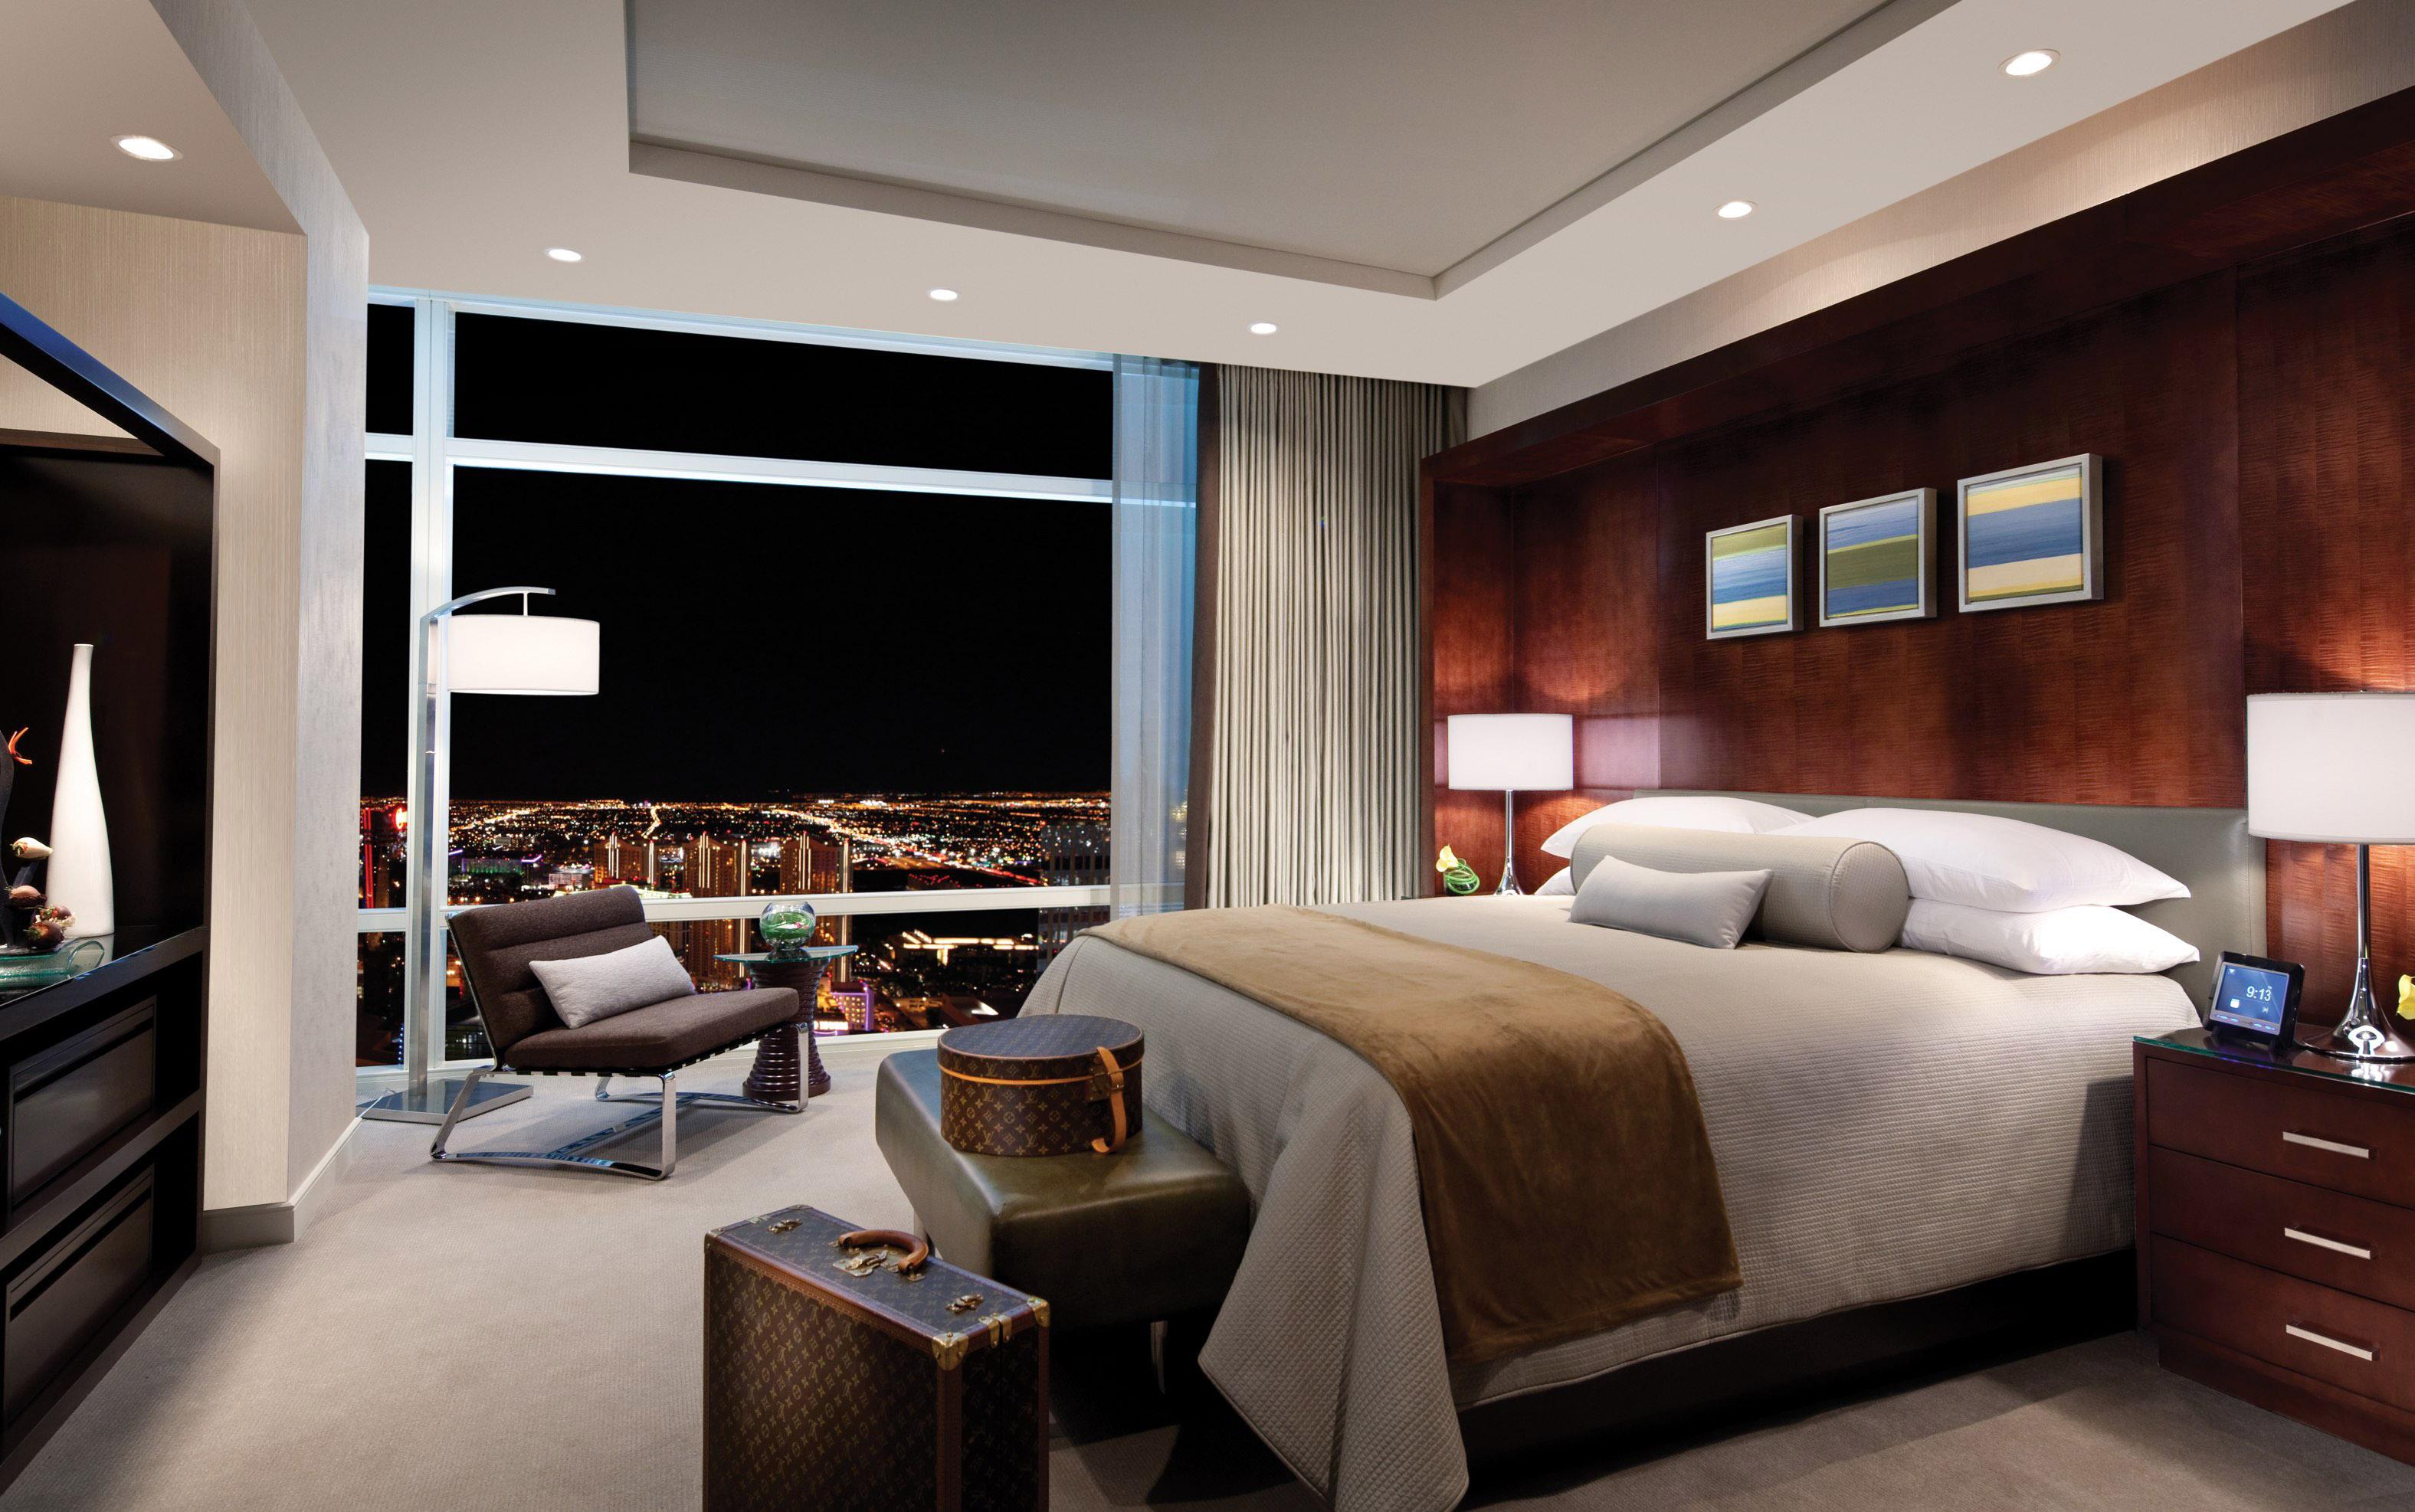 2 Bedroom Aria. 2 Bedroom Penthouse Aria   Rooms